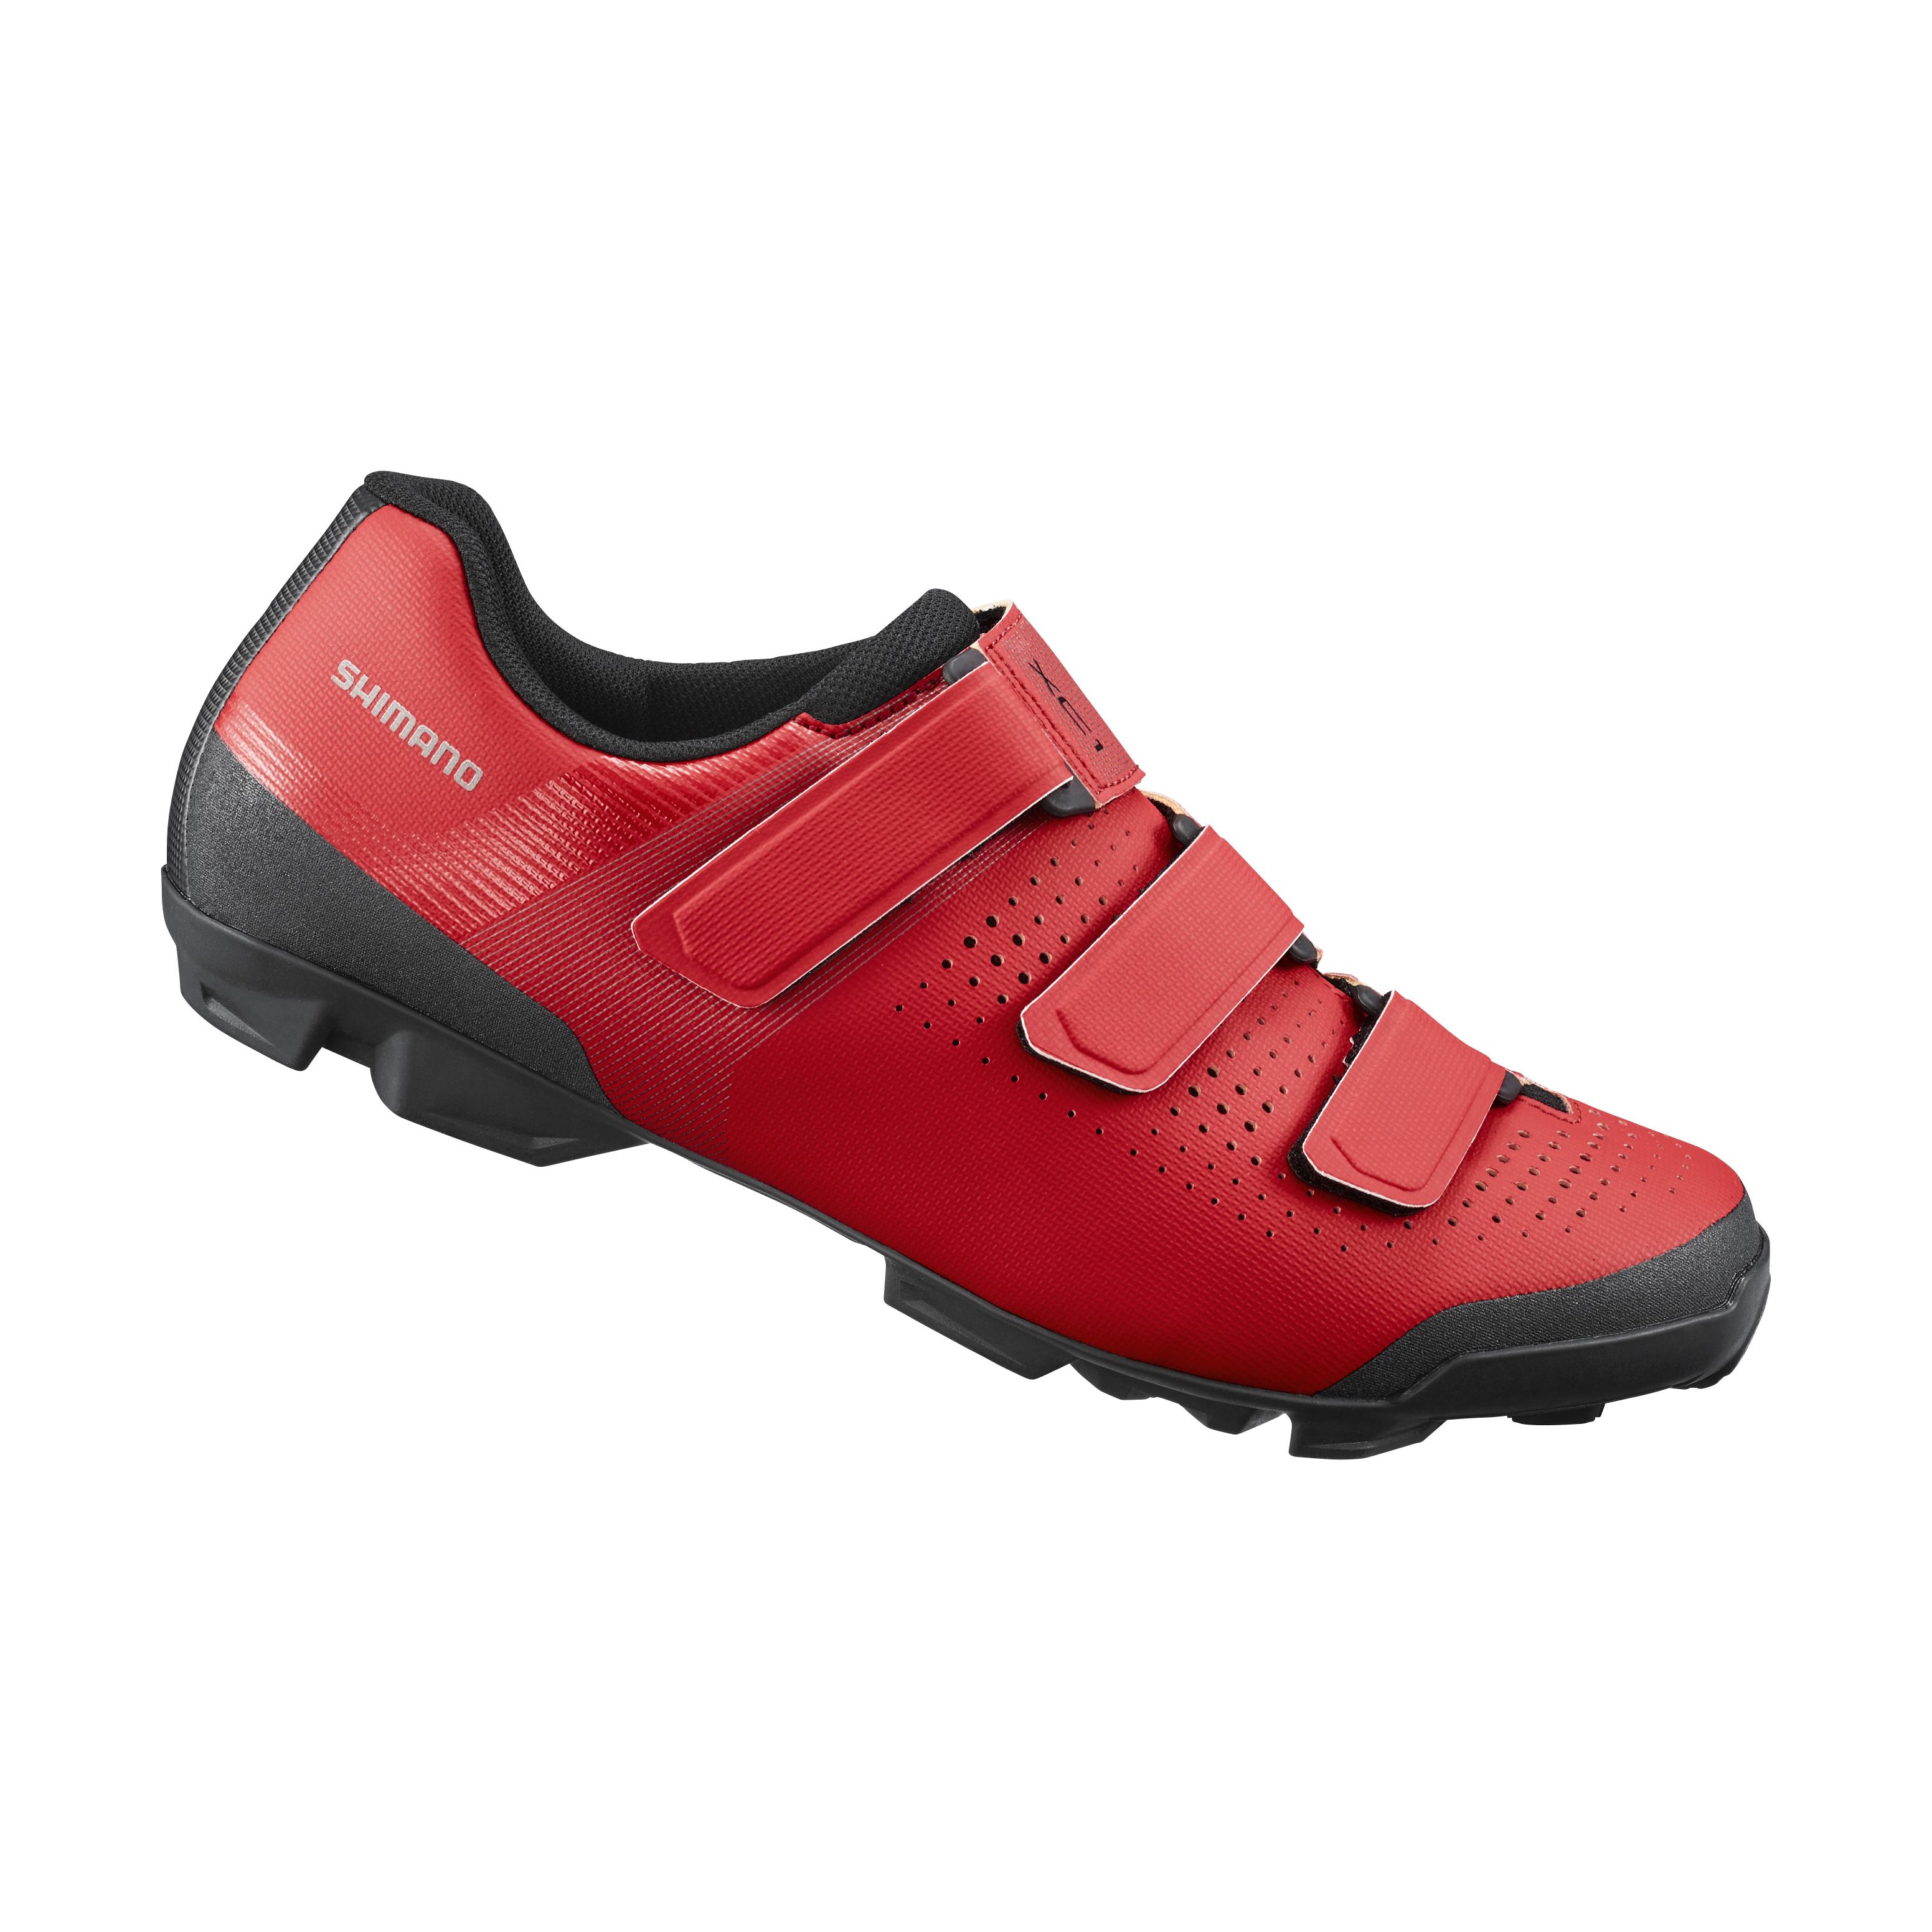 SHIMANO MTB obuv SH-XC100, červená, 38